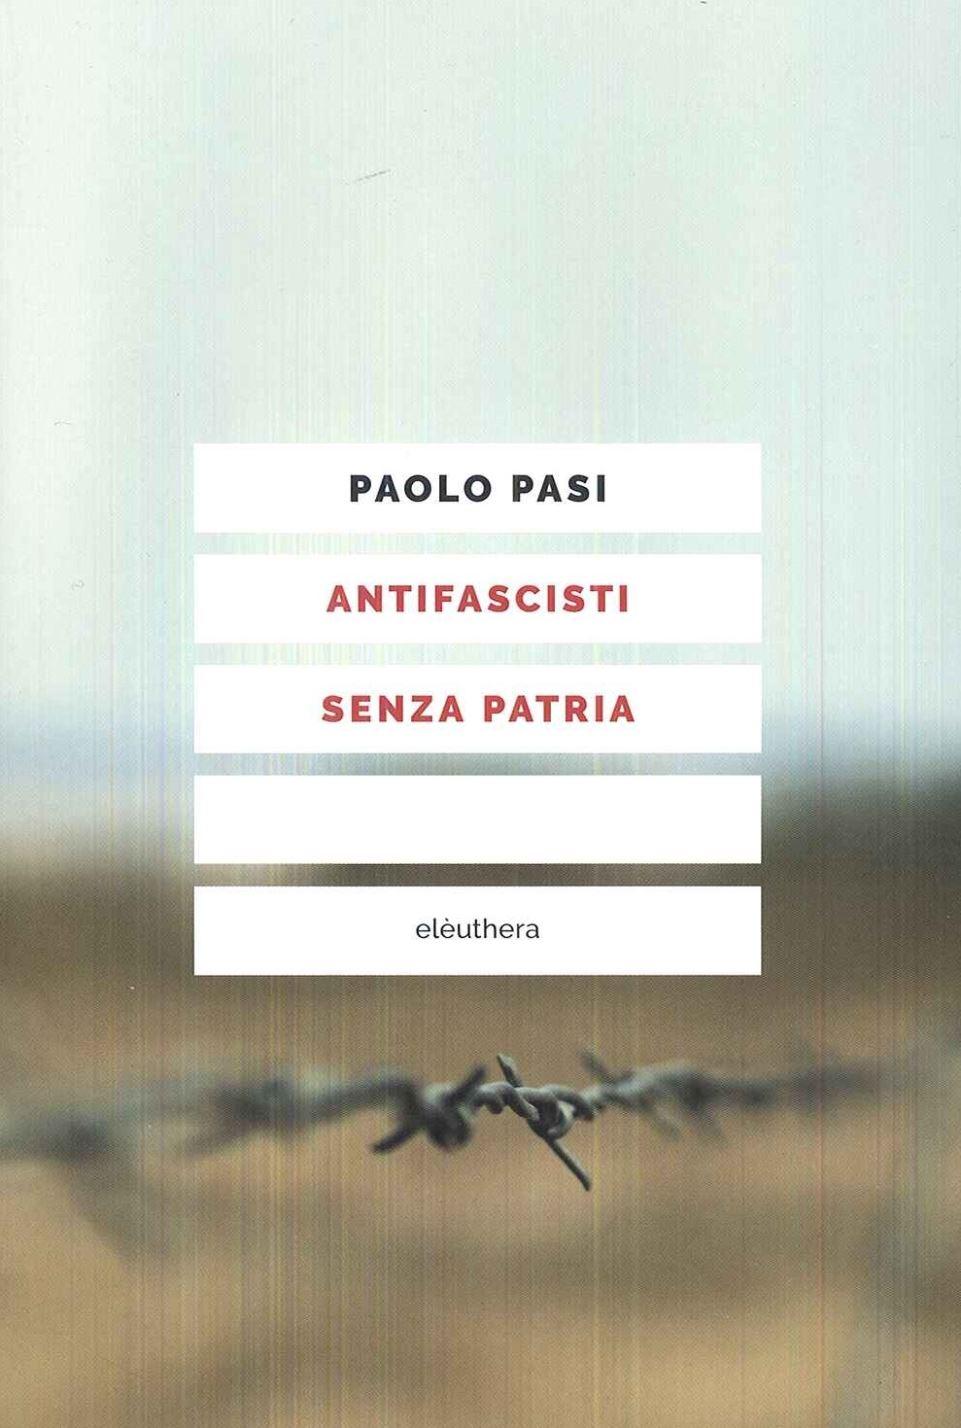 Paolo Pasi